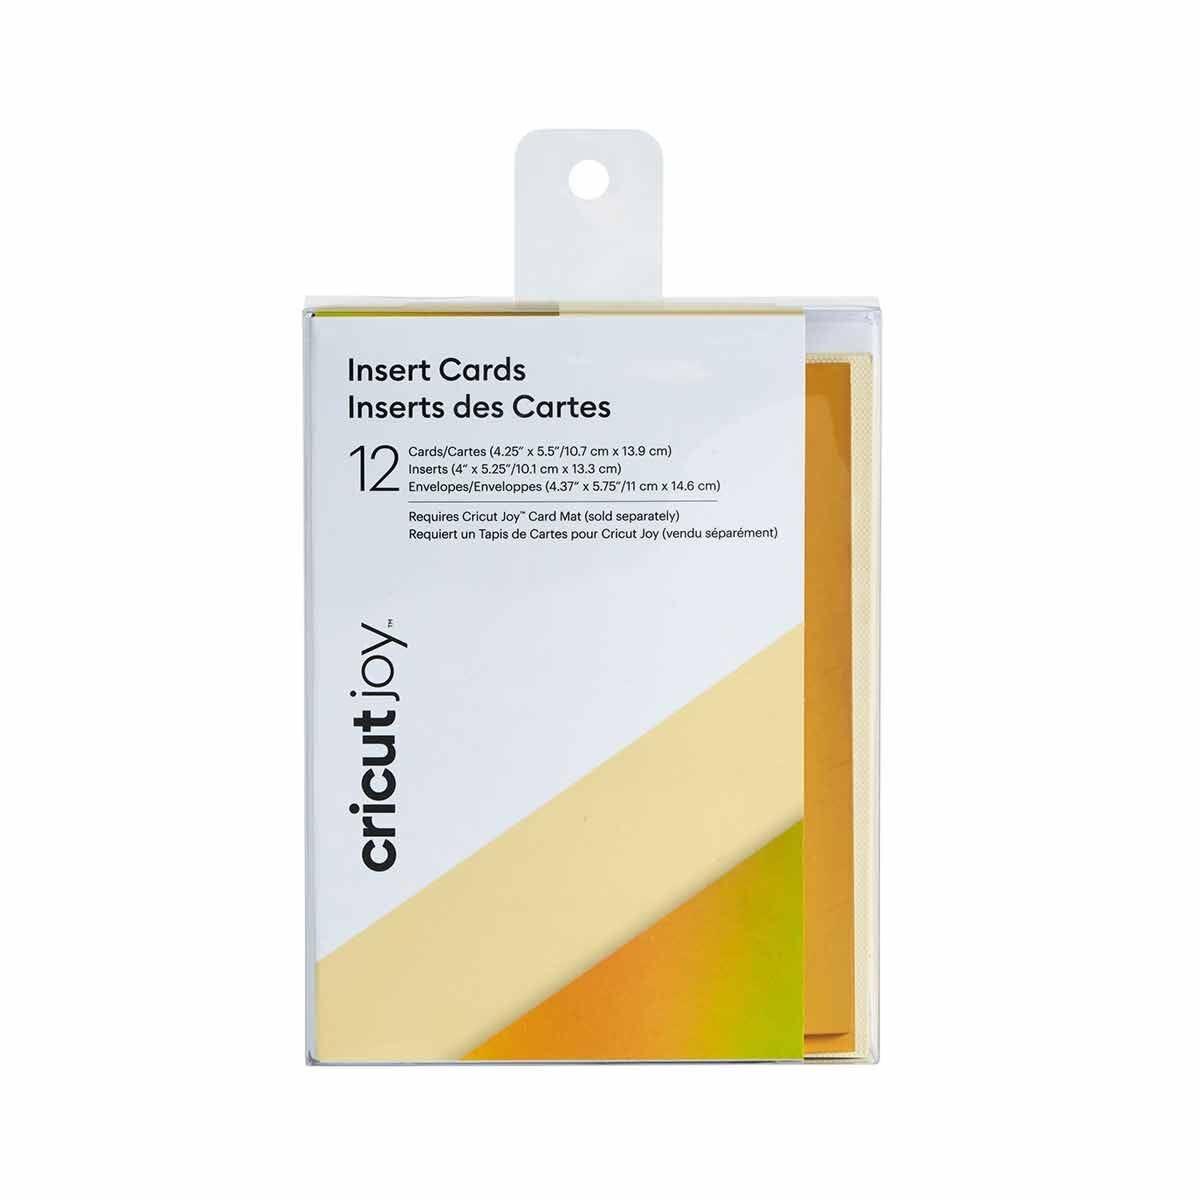 Cricut Joy Insert Cards Pack of 12 Cream/Holographic